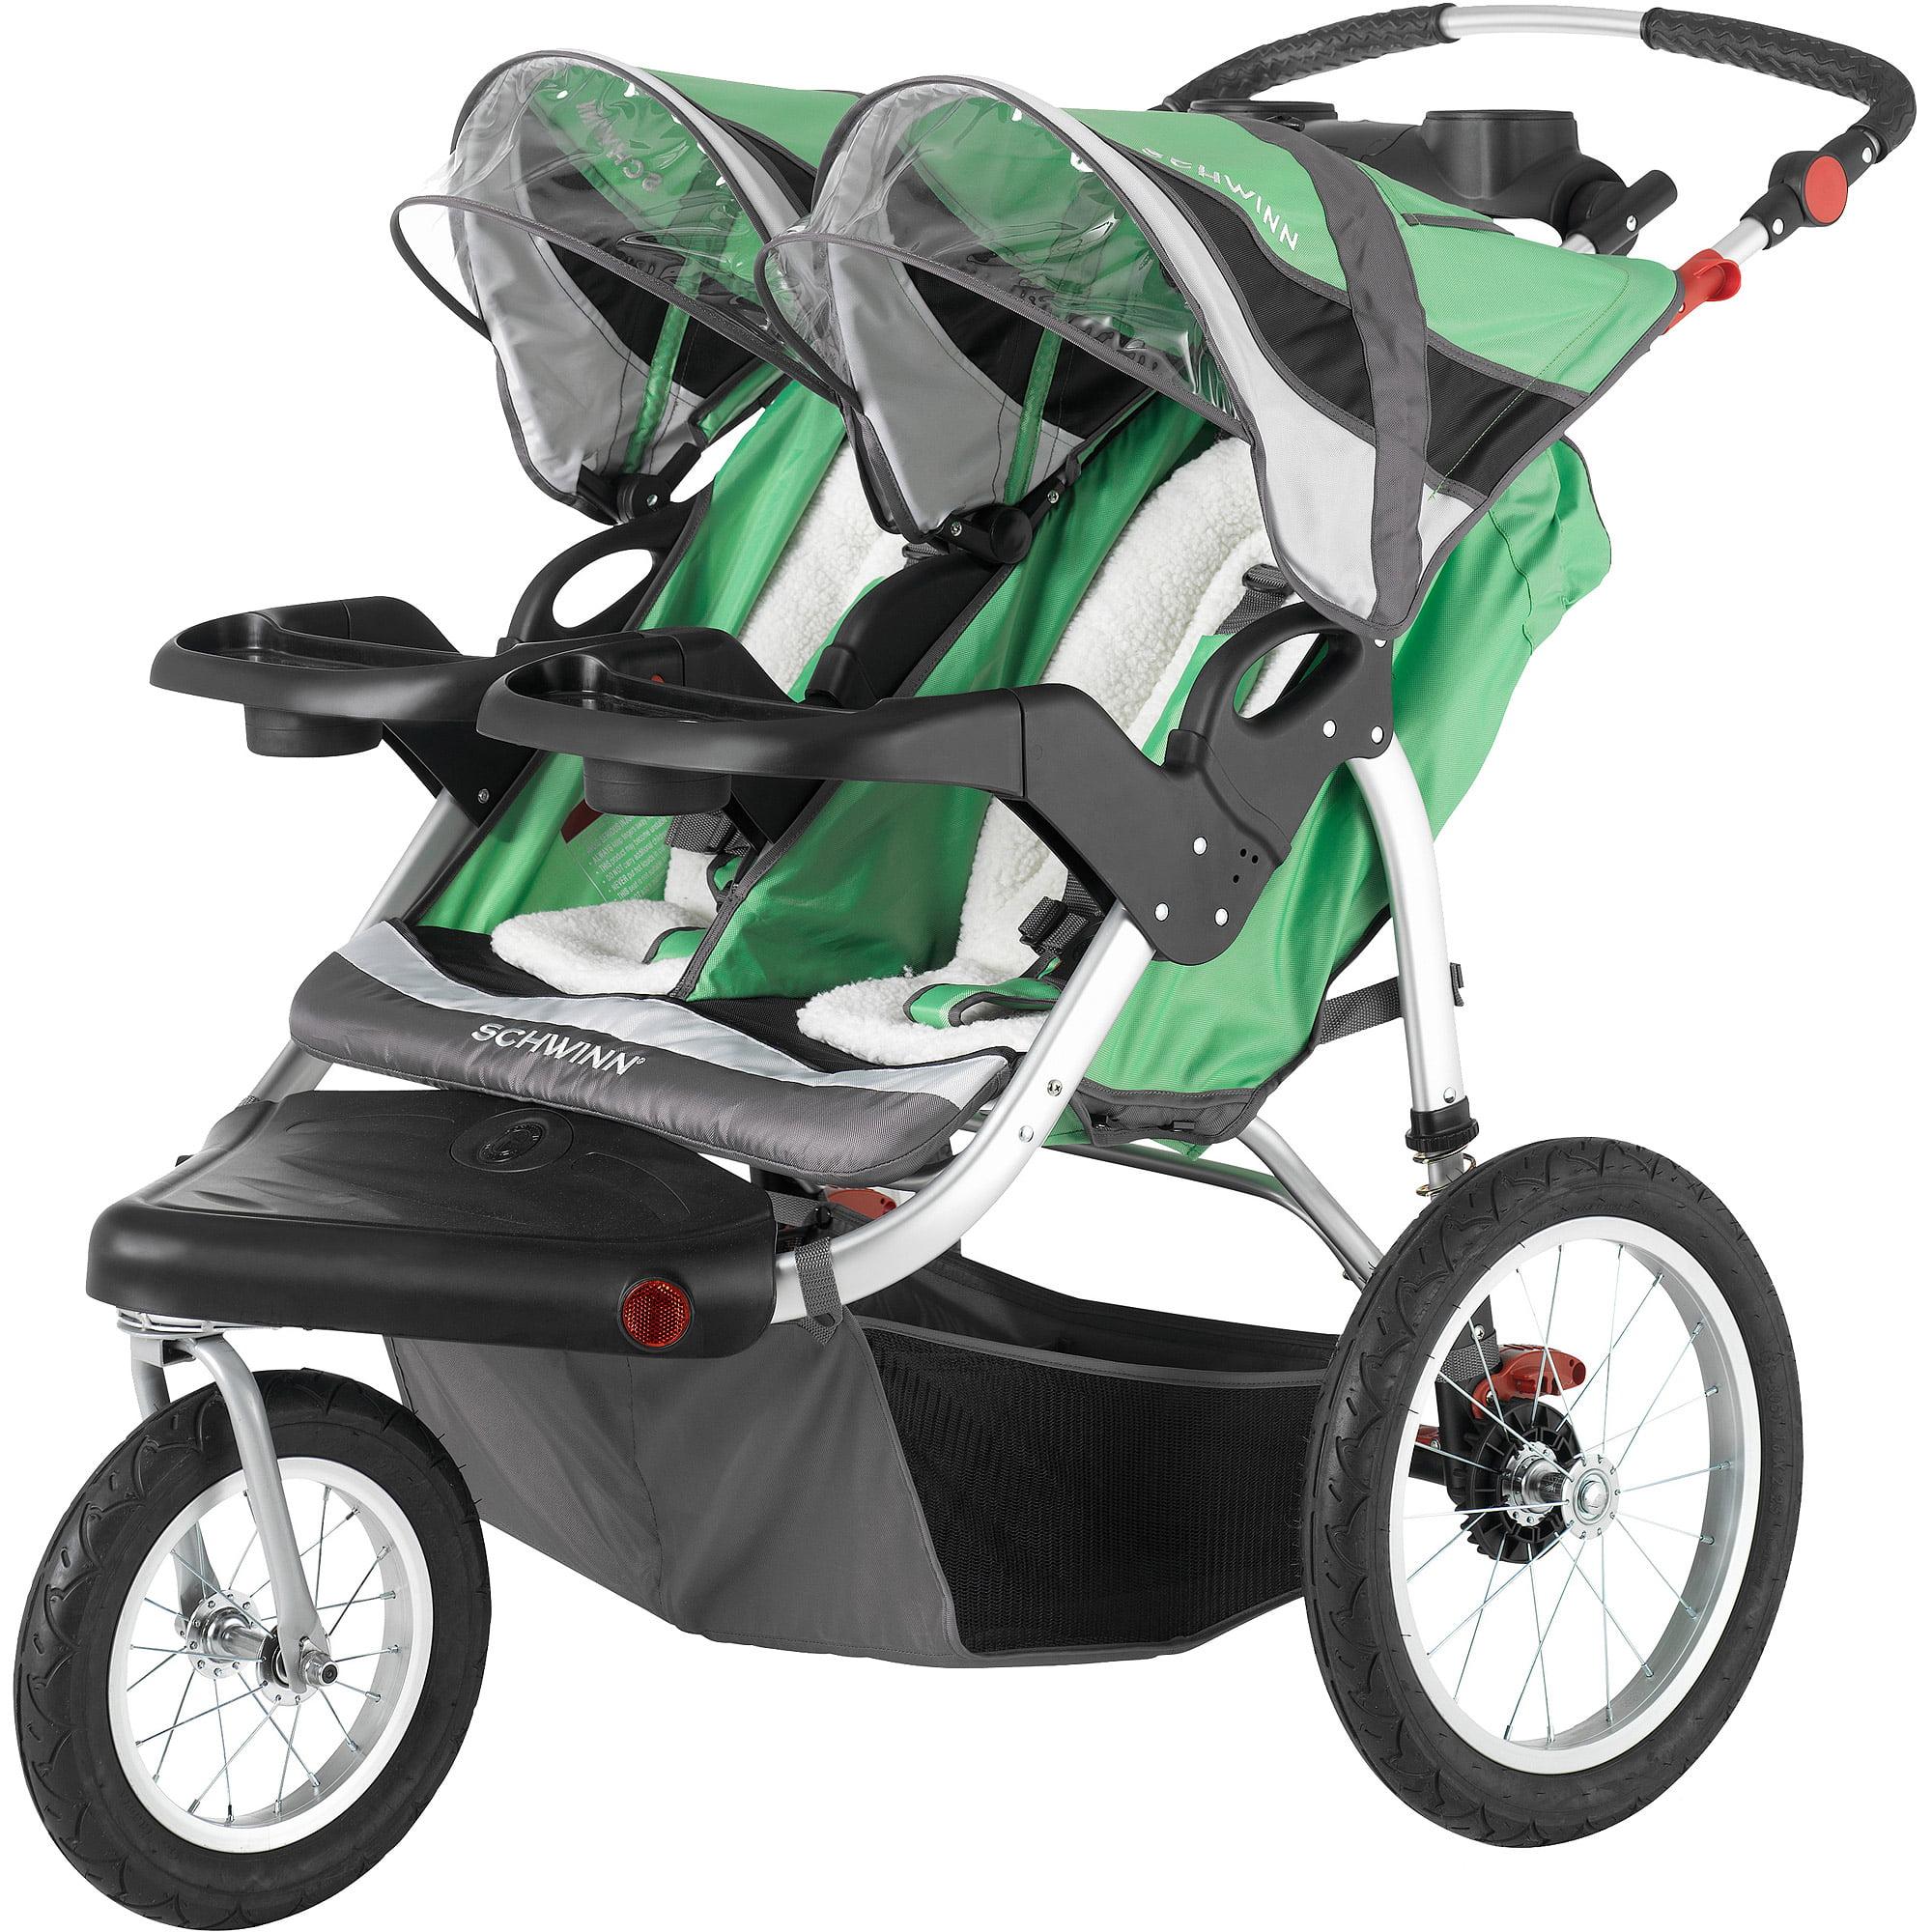 Schwinn Turismo Double Jogging Stroller - Walmart.com